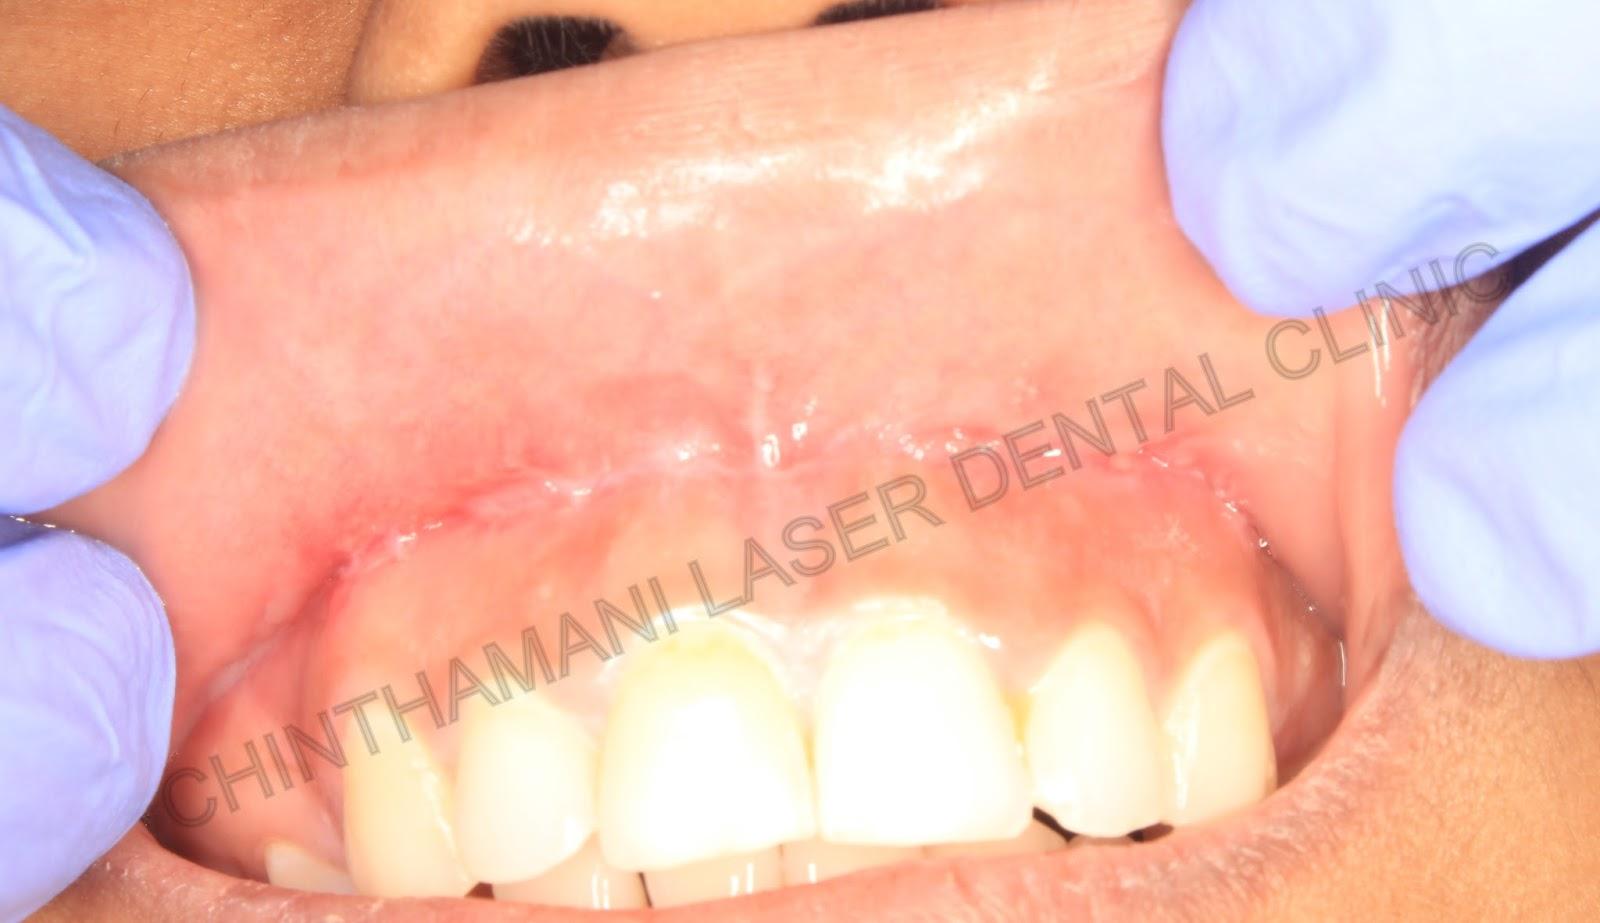 Chinthamani Laser Dental Clinic Lip Repositioning Surgery